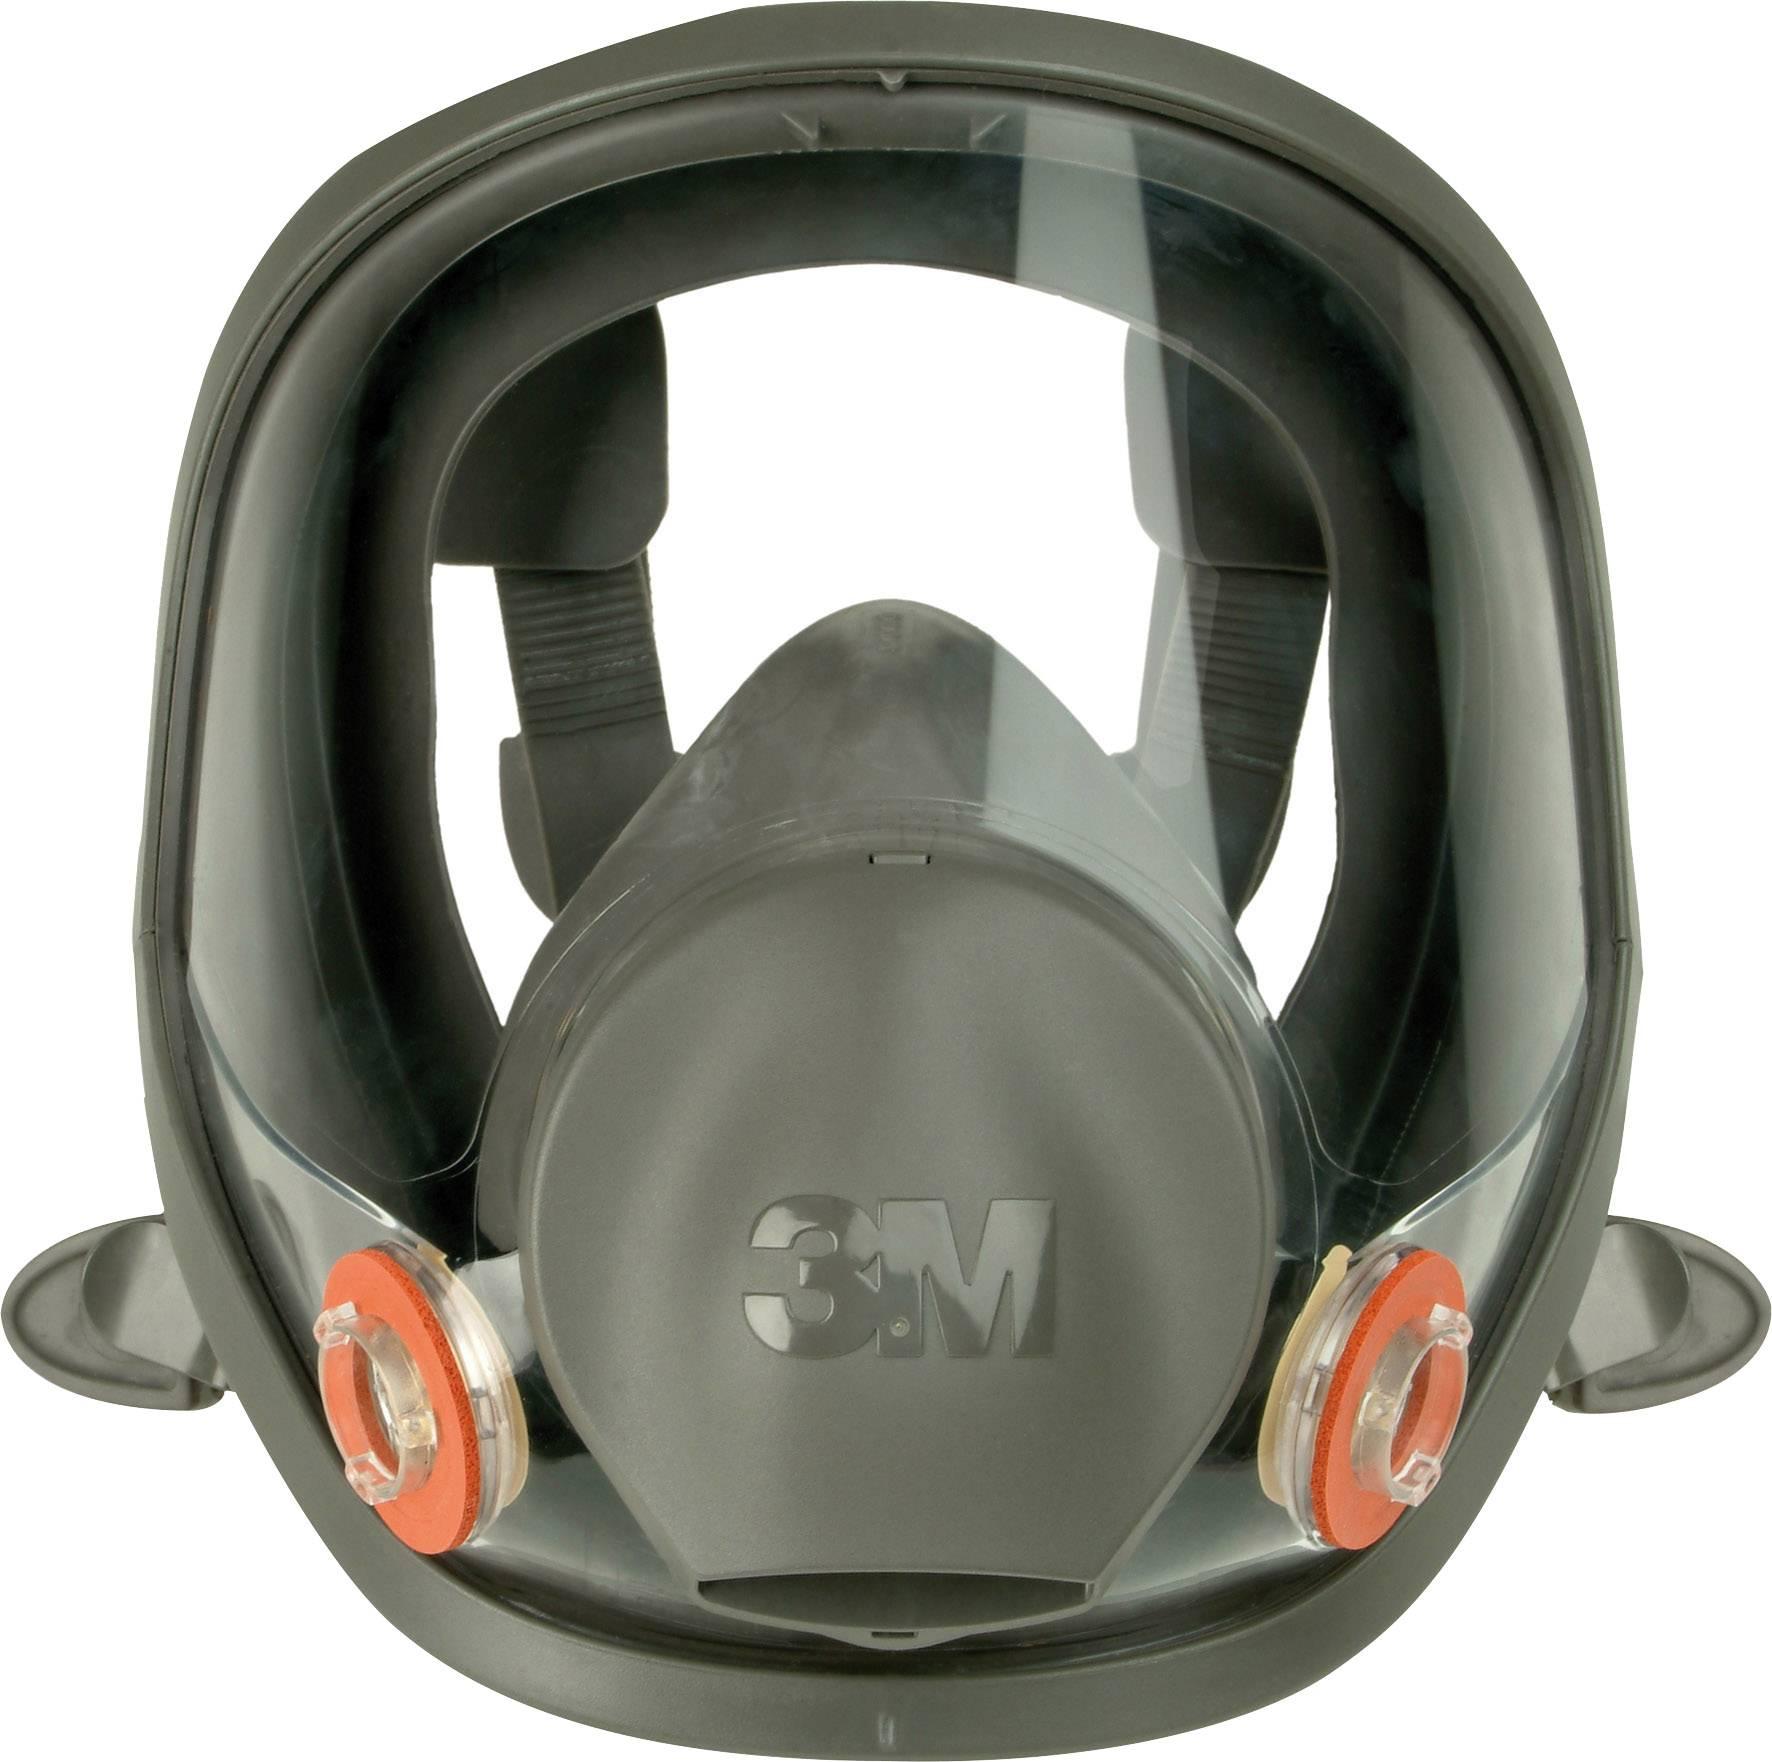 Ochranná maska celotvárová 3M 6800M, bez filtru, veľ. M